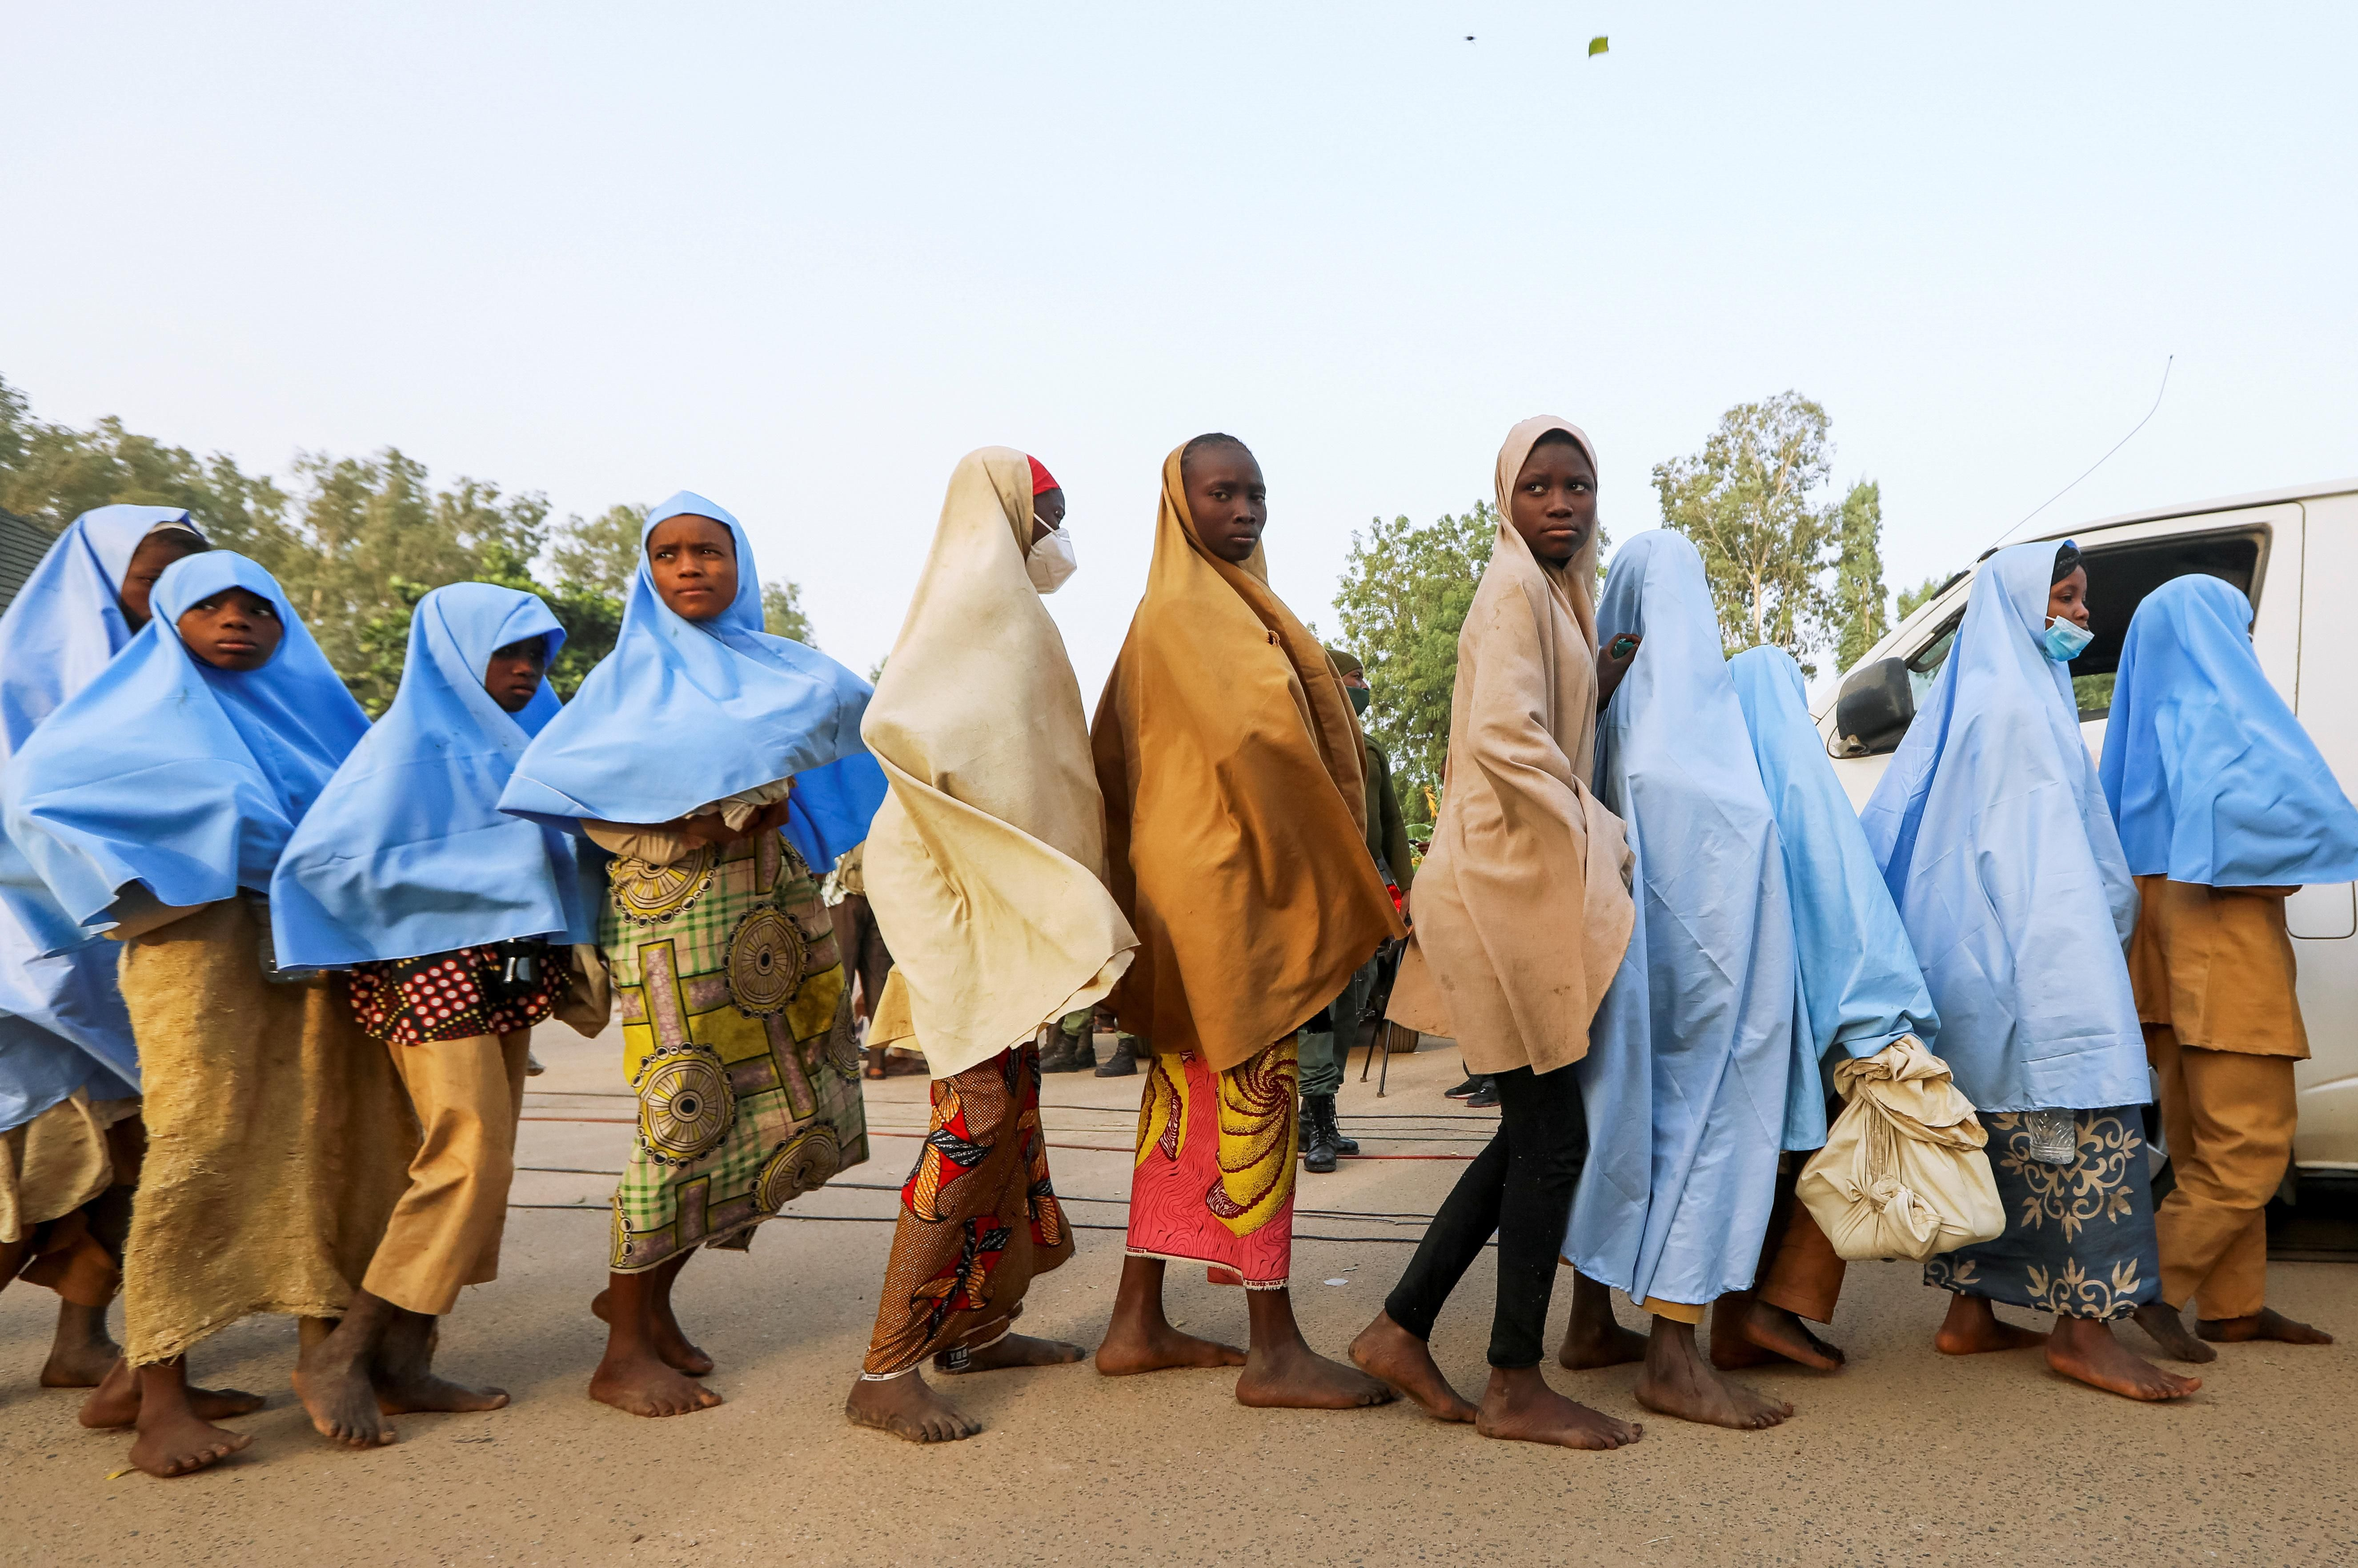 Girls who were kidnapped from a boarding school in the northwest Nigerian state of Zamfara walk in line after their release, in Zamfara, Nigeria March 2, 2021